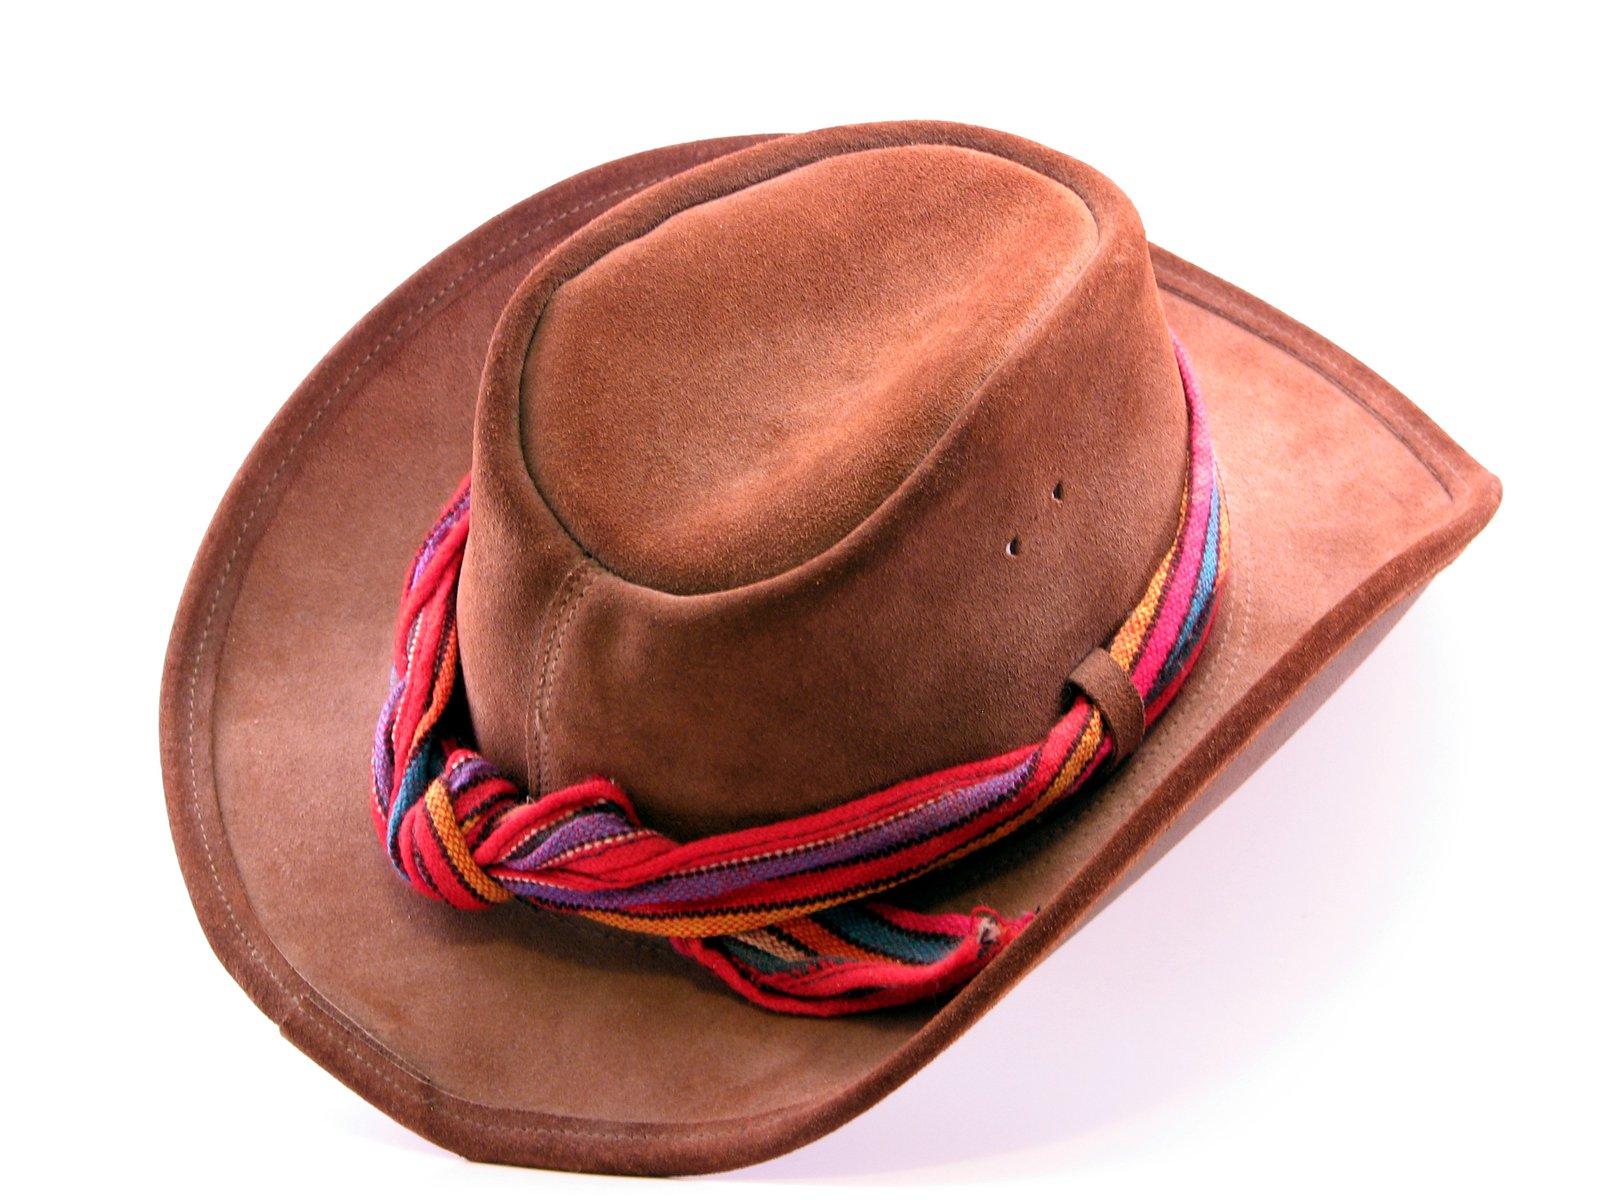 84d8d5c77e9 Greg Bourdy Western Hats Amazon